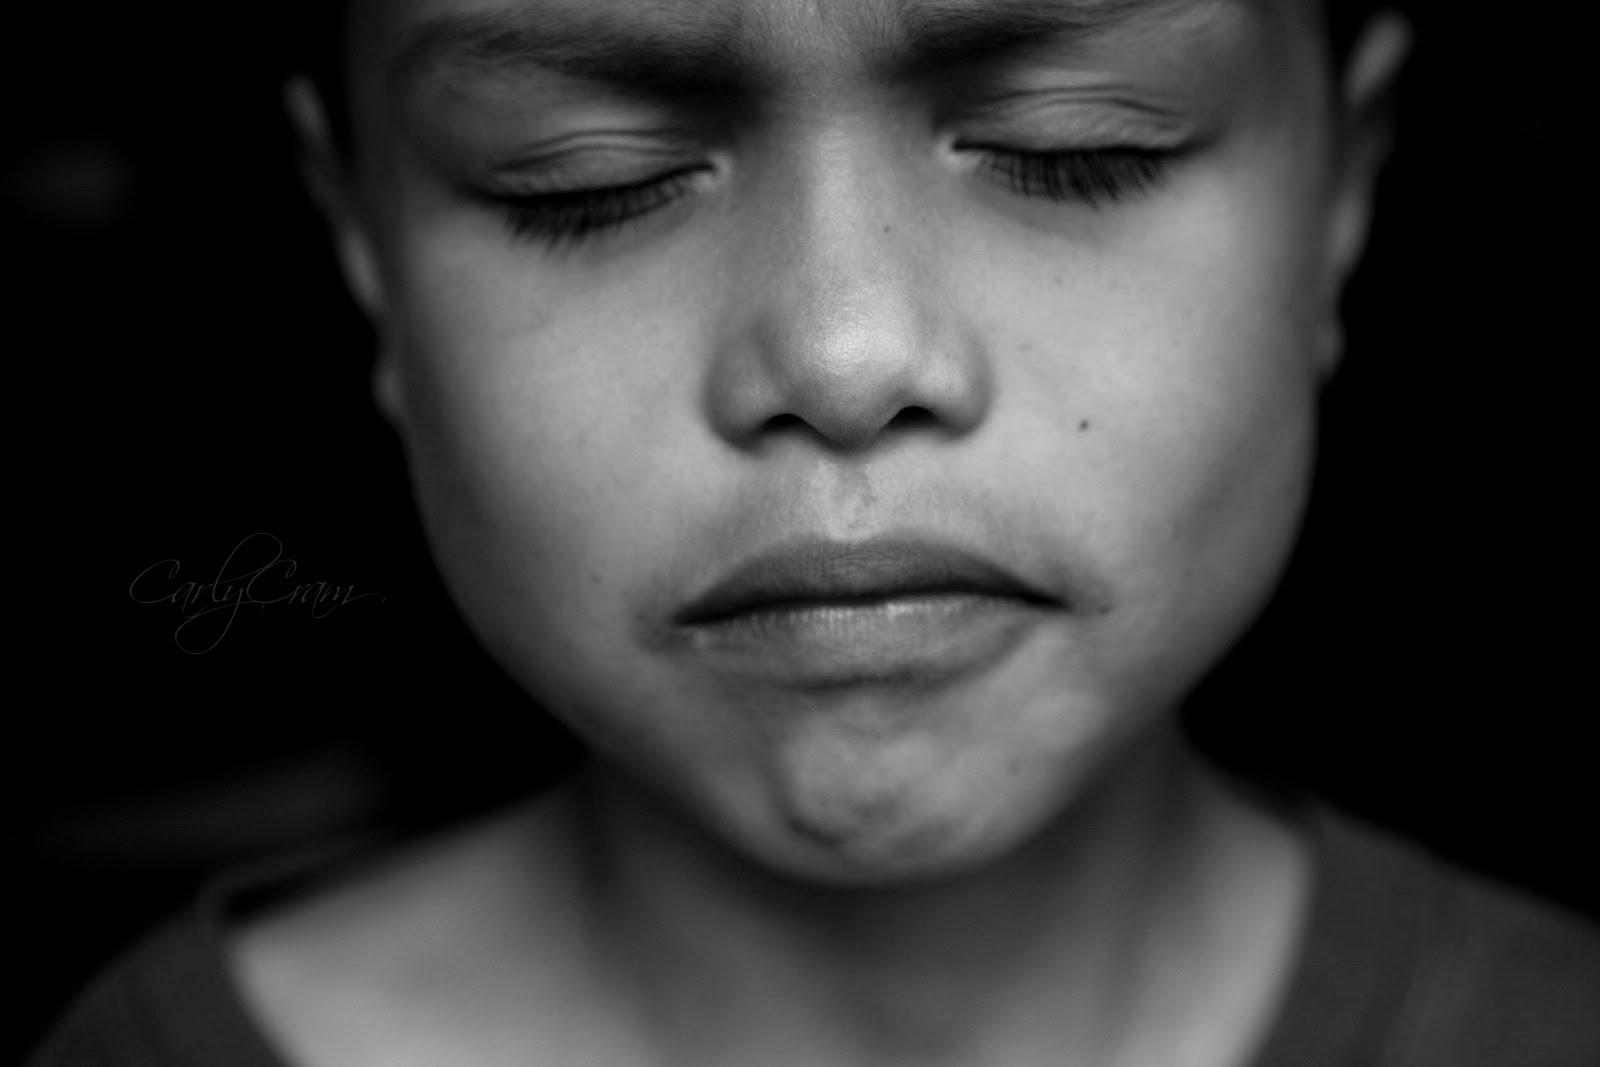 carlycram_sad_kids_closed_eyes_10